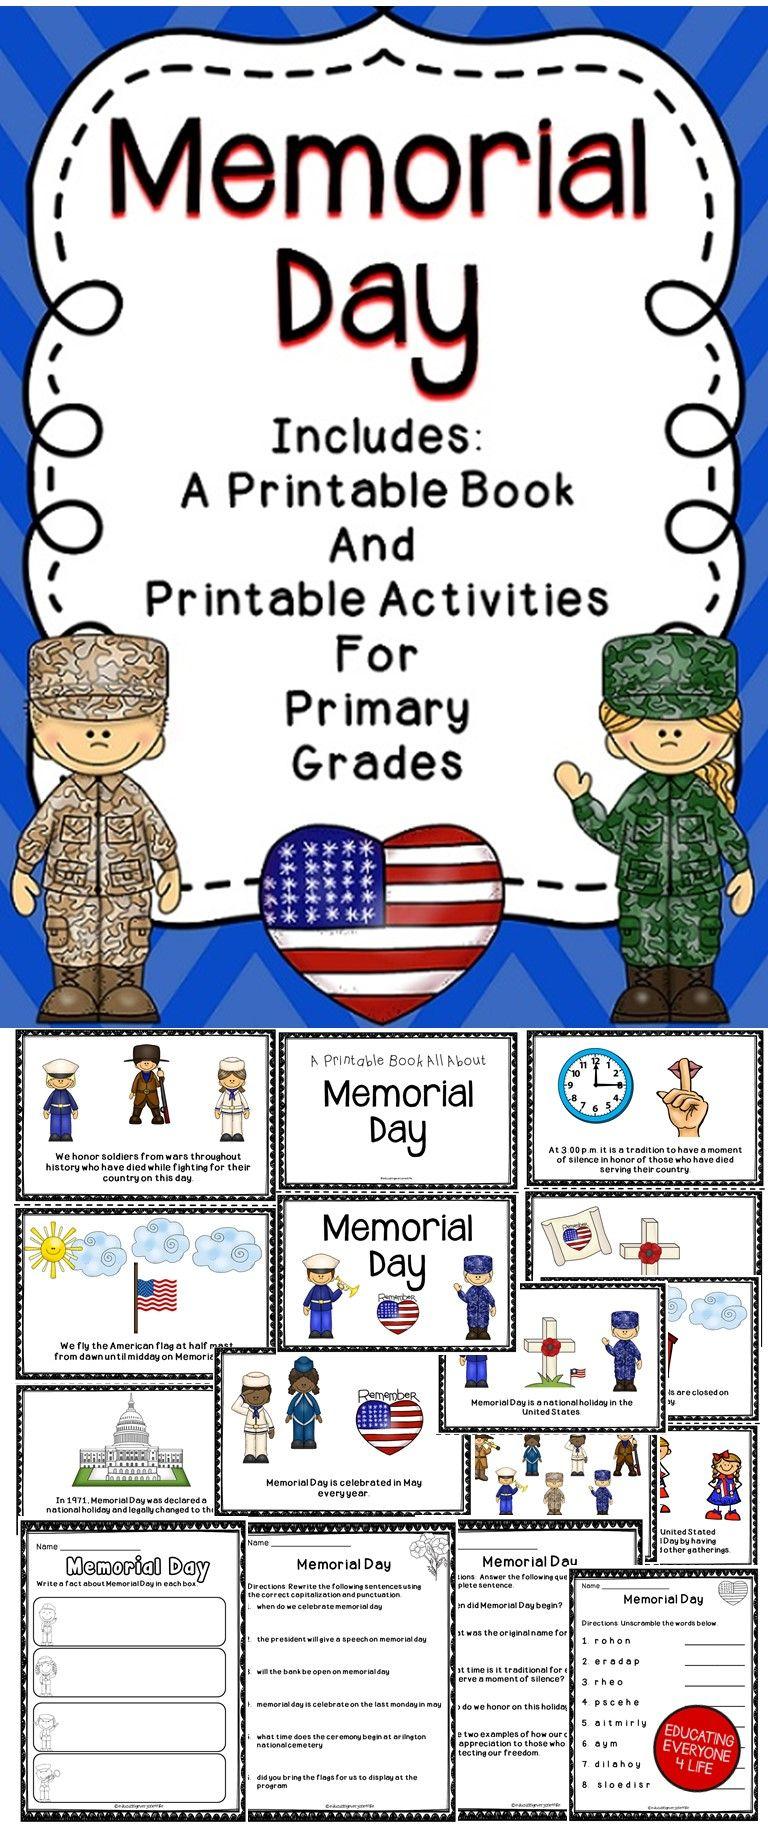 Memorial Day Activity Book Memorial Day Activities Book Activities Memorial Day [ 1824 x 768 Pixel ]